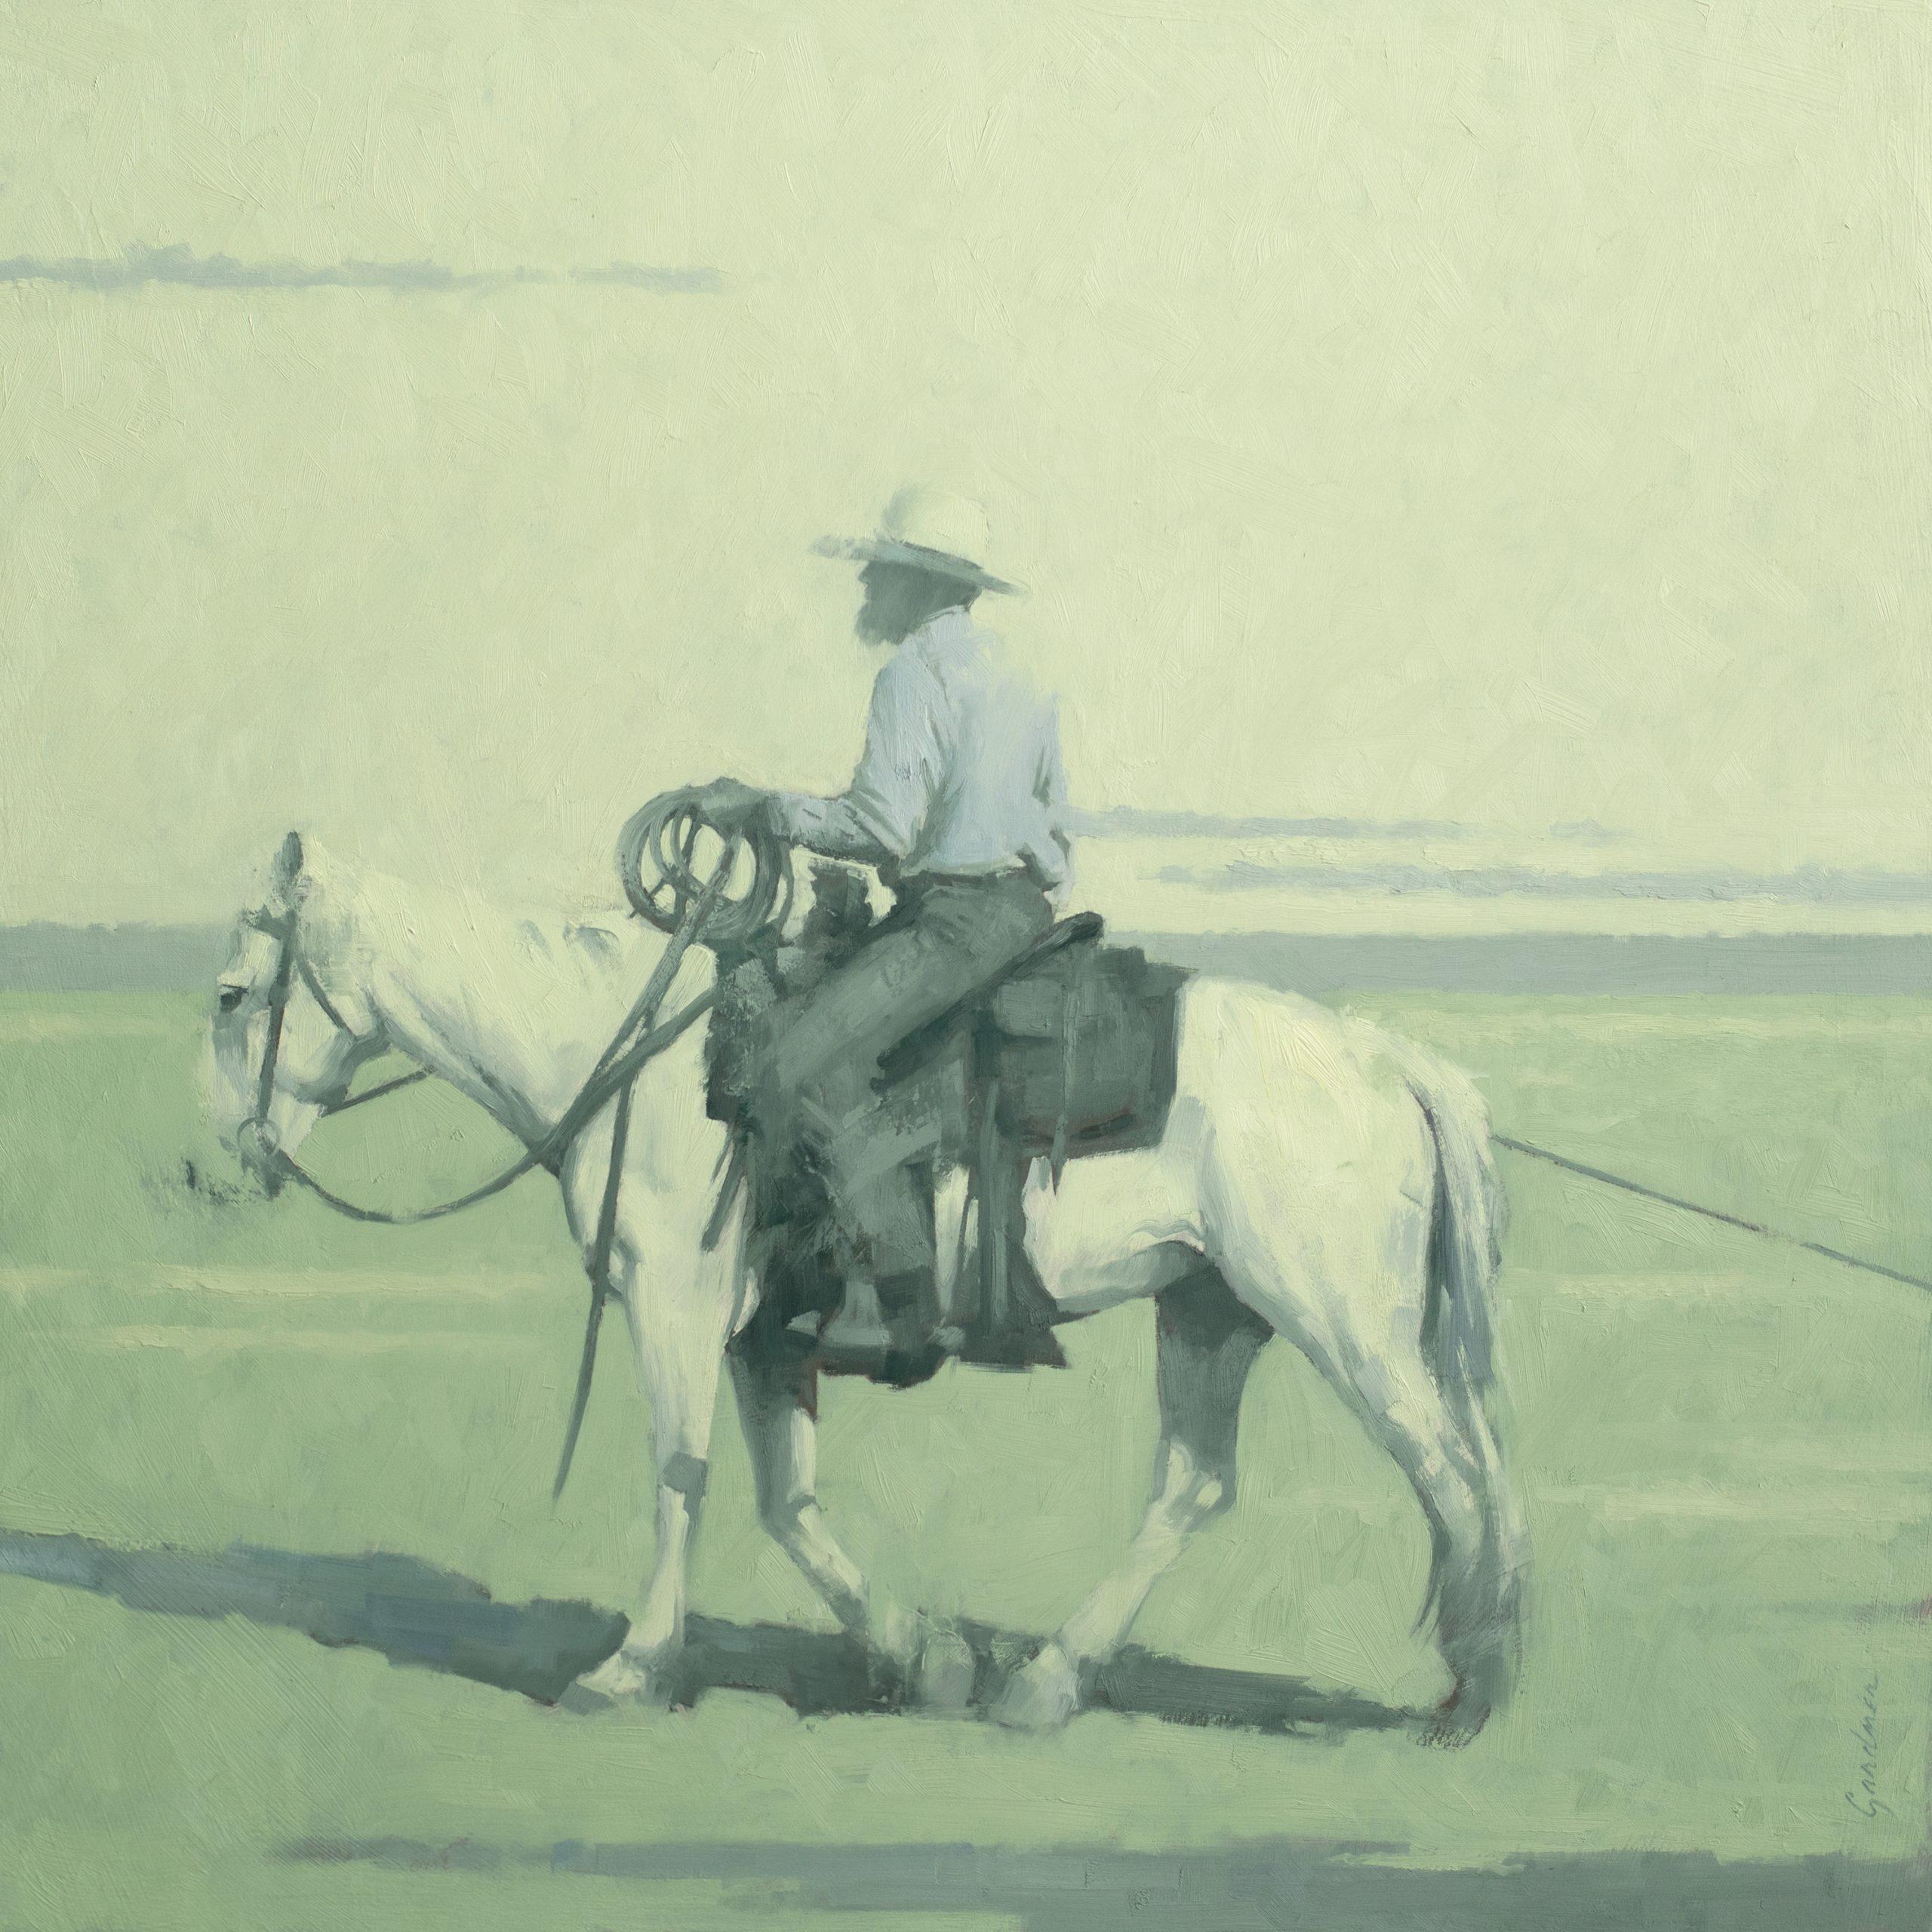 Terry  Gardner - Tightrope II